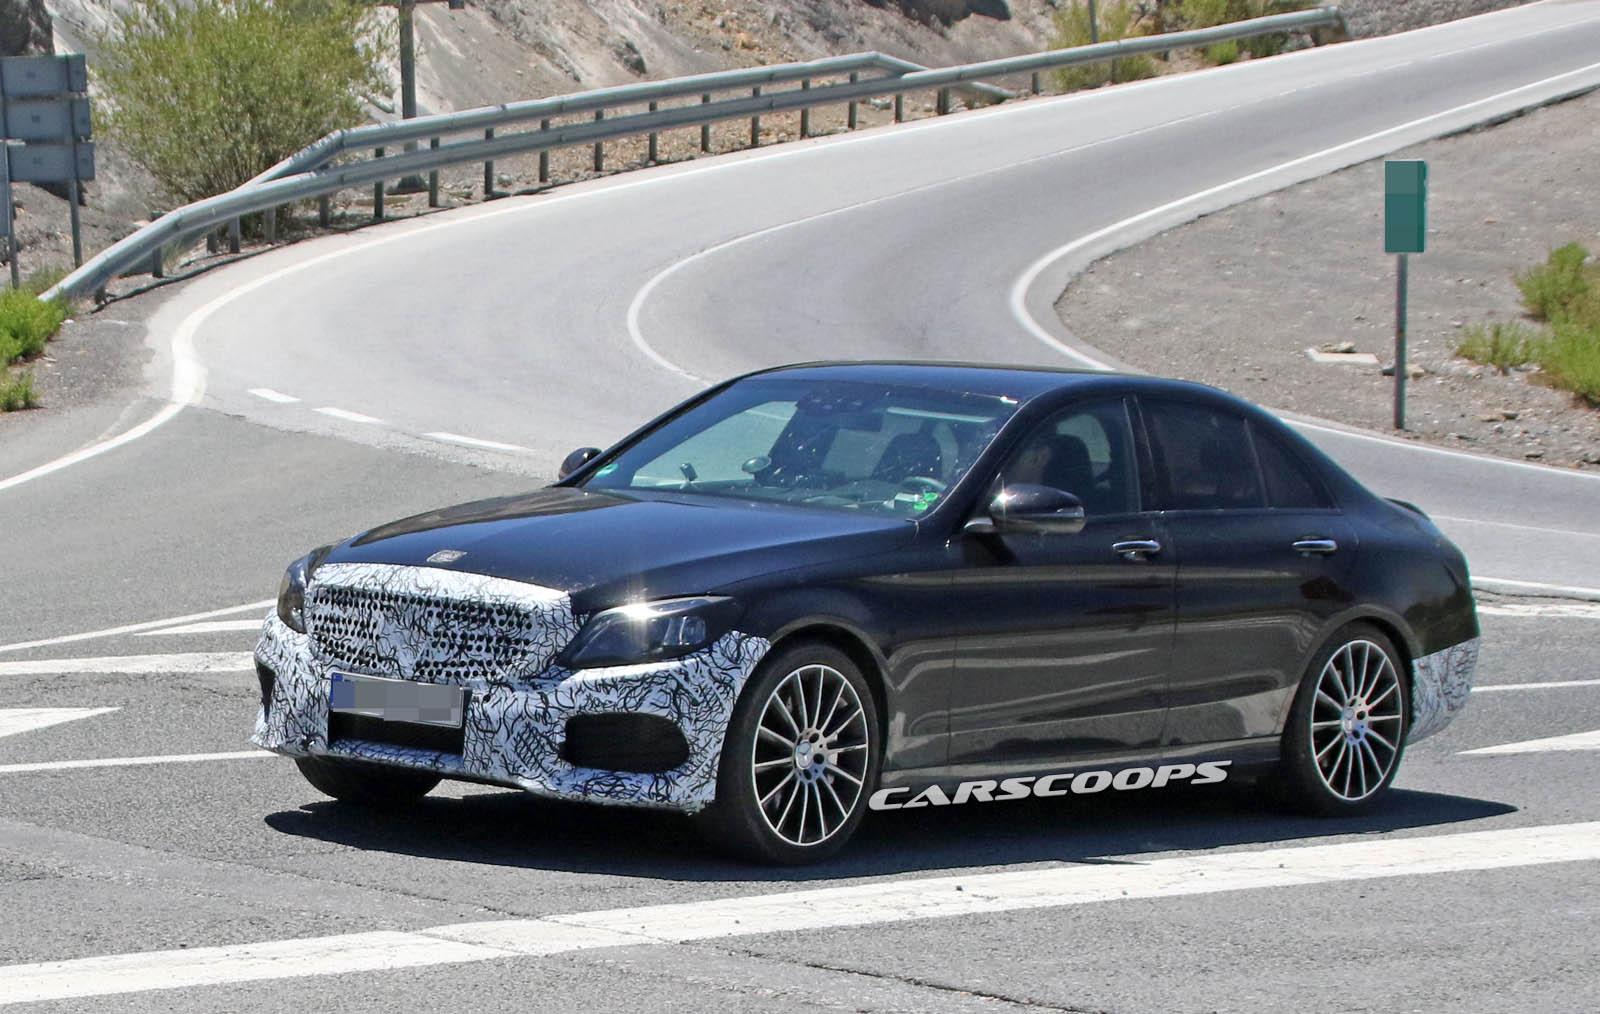 Mercedes C-Class facelift 2 copy.jpg